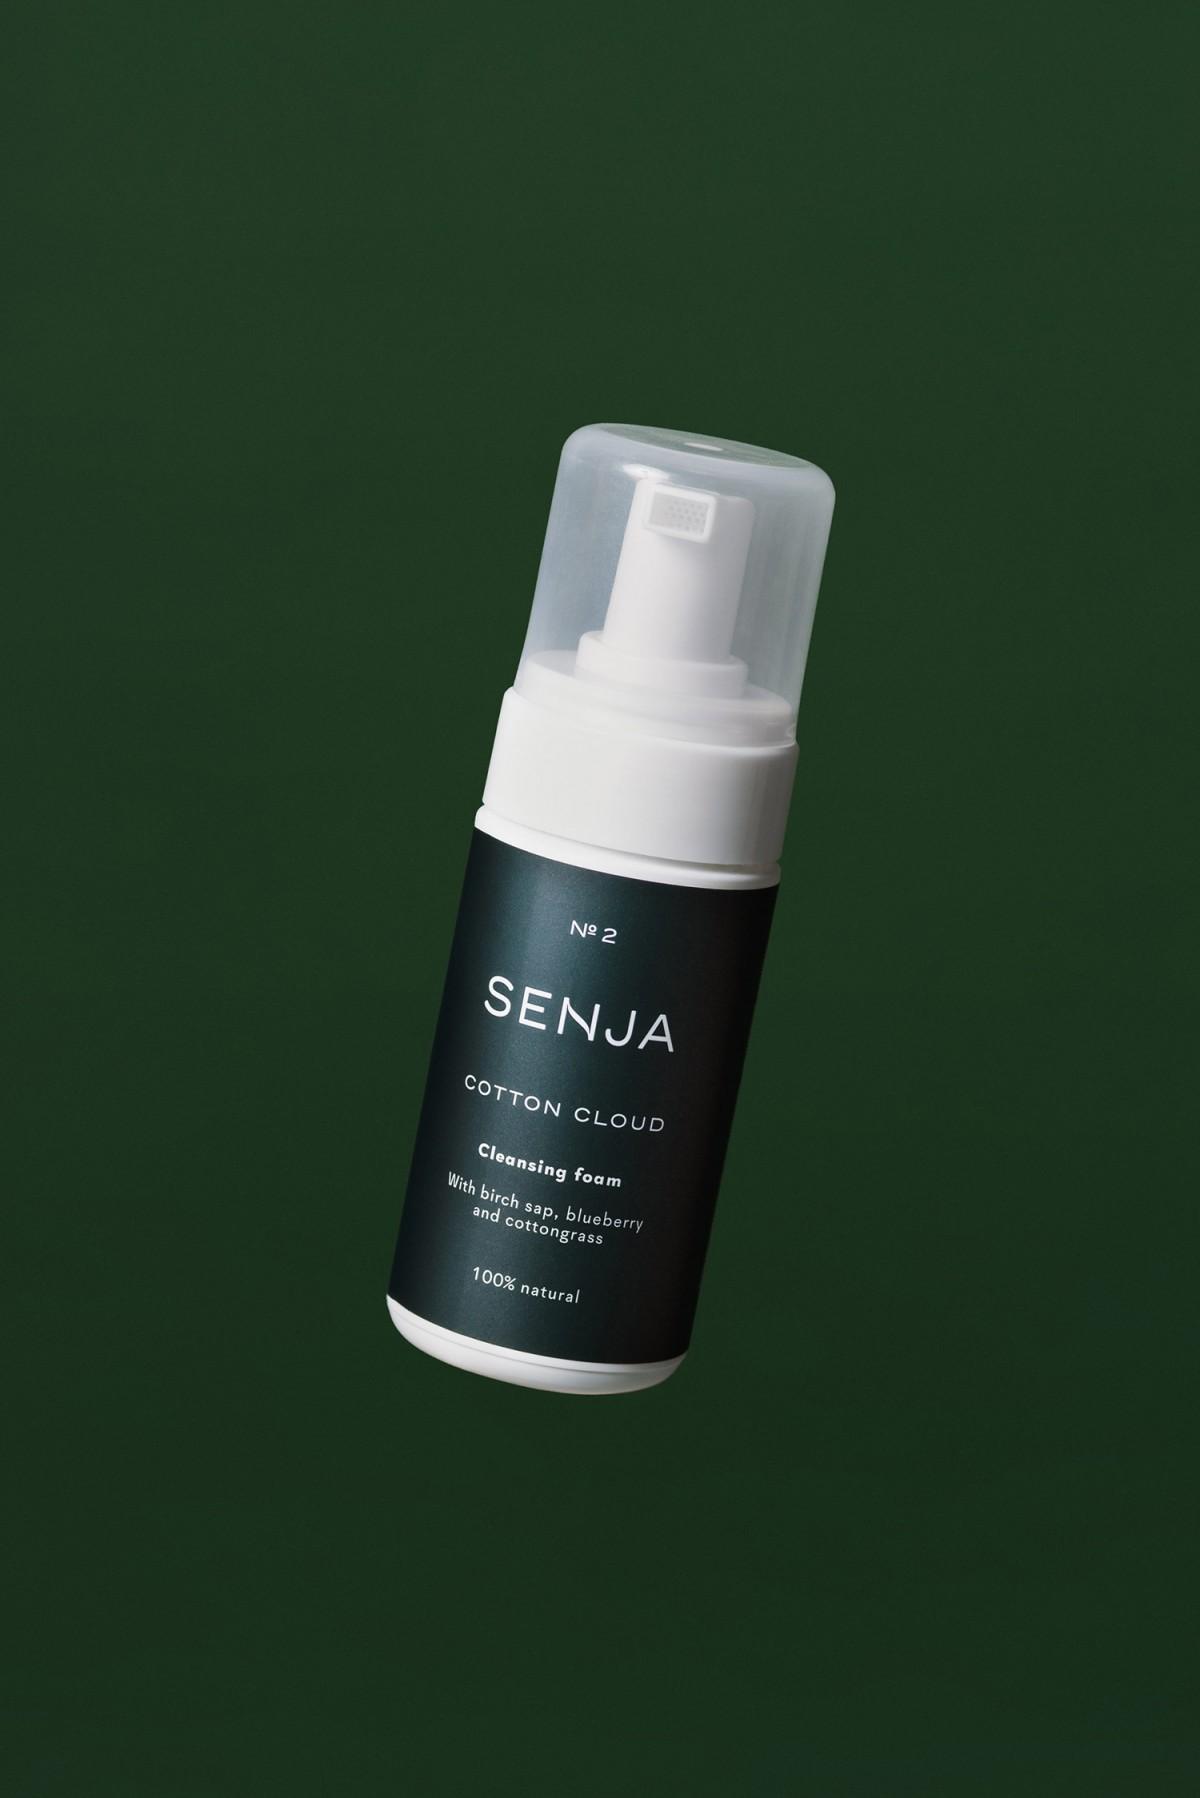 Senja纳维亚高级化妆品品牌vi设计,包装设计